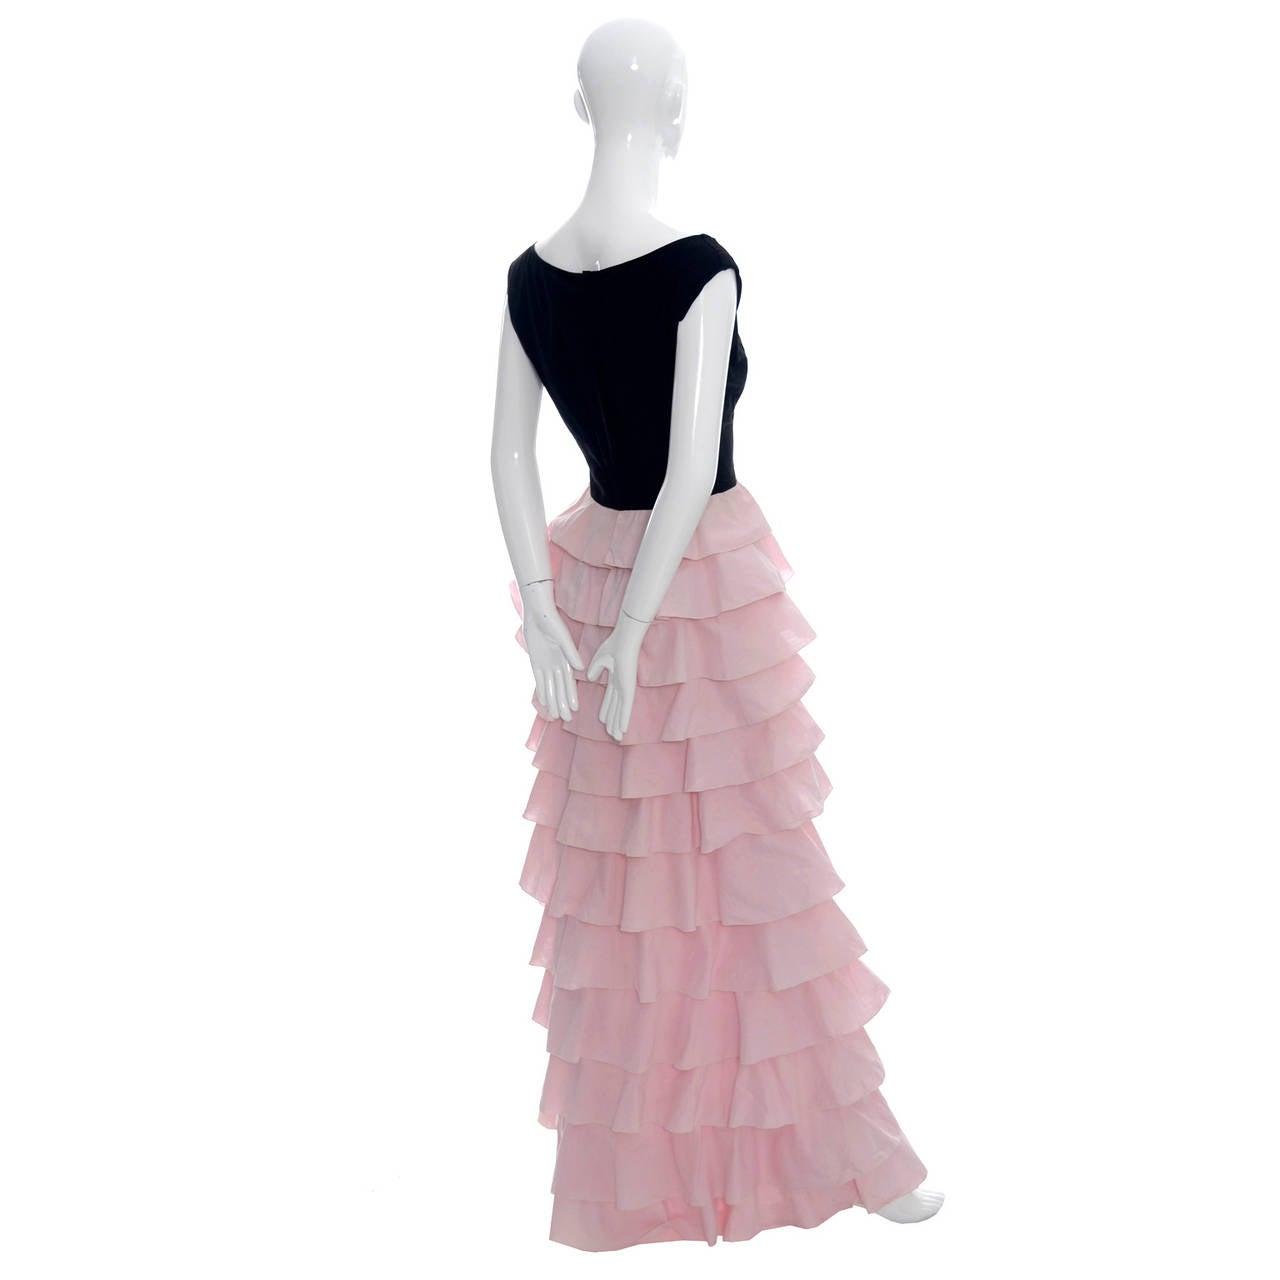 1940s Vintage Gilbert Adrian Original Dress Pink Ruffles Rare Designer Gown 6